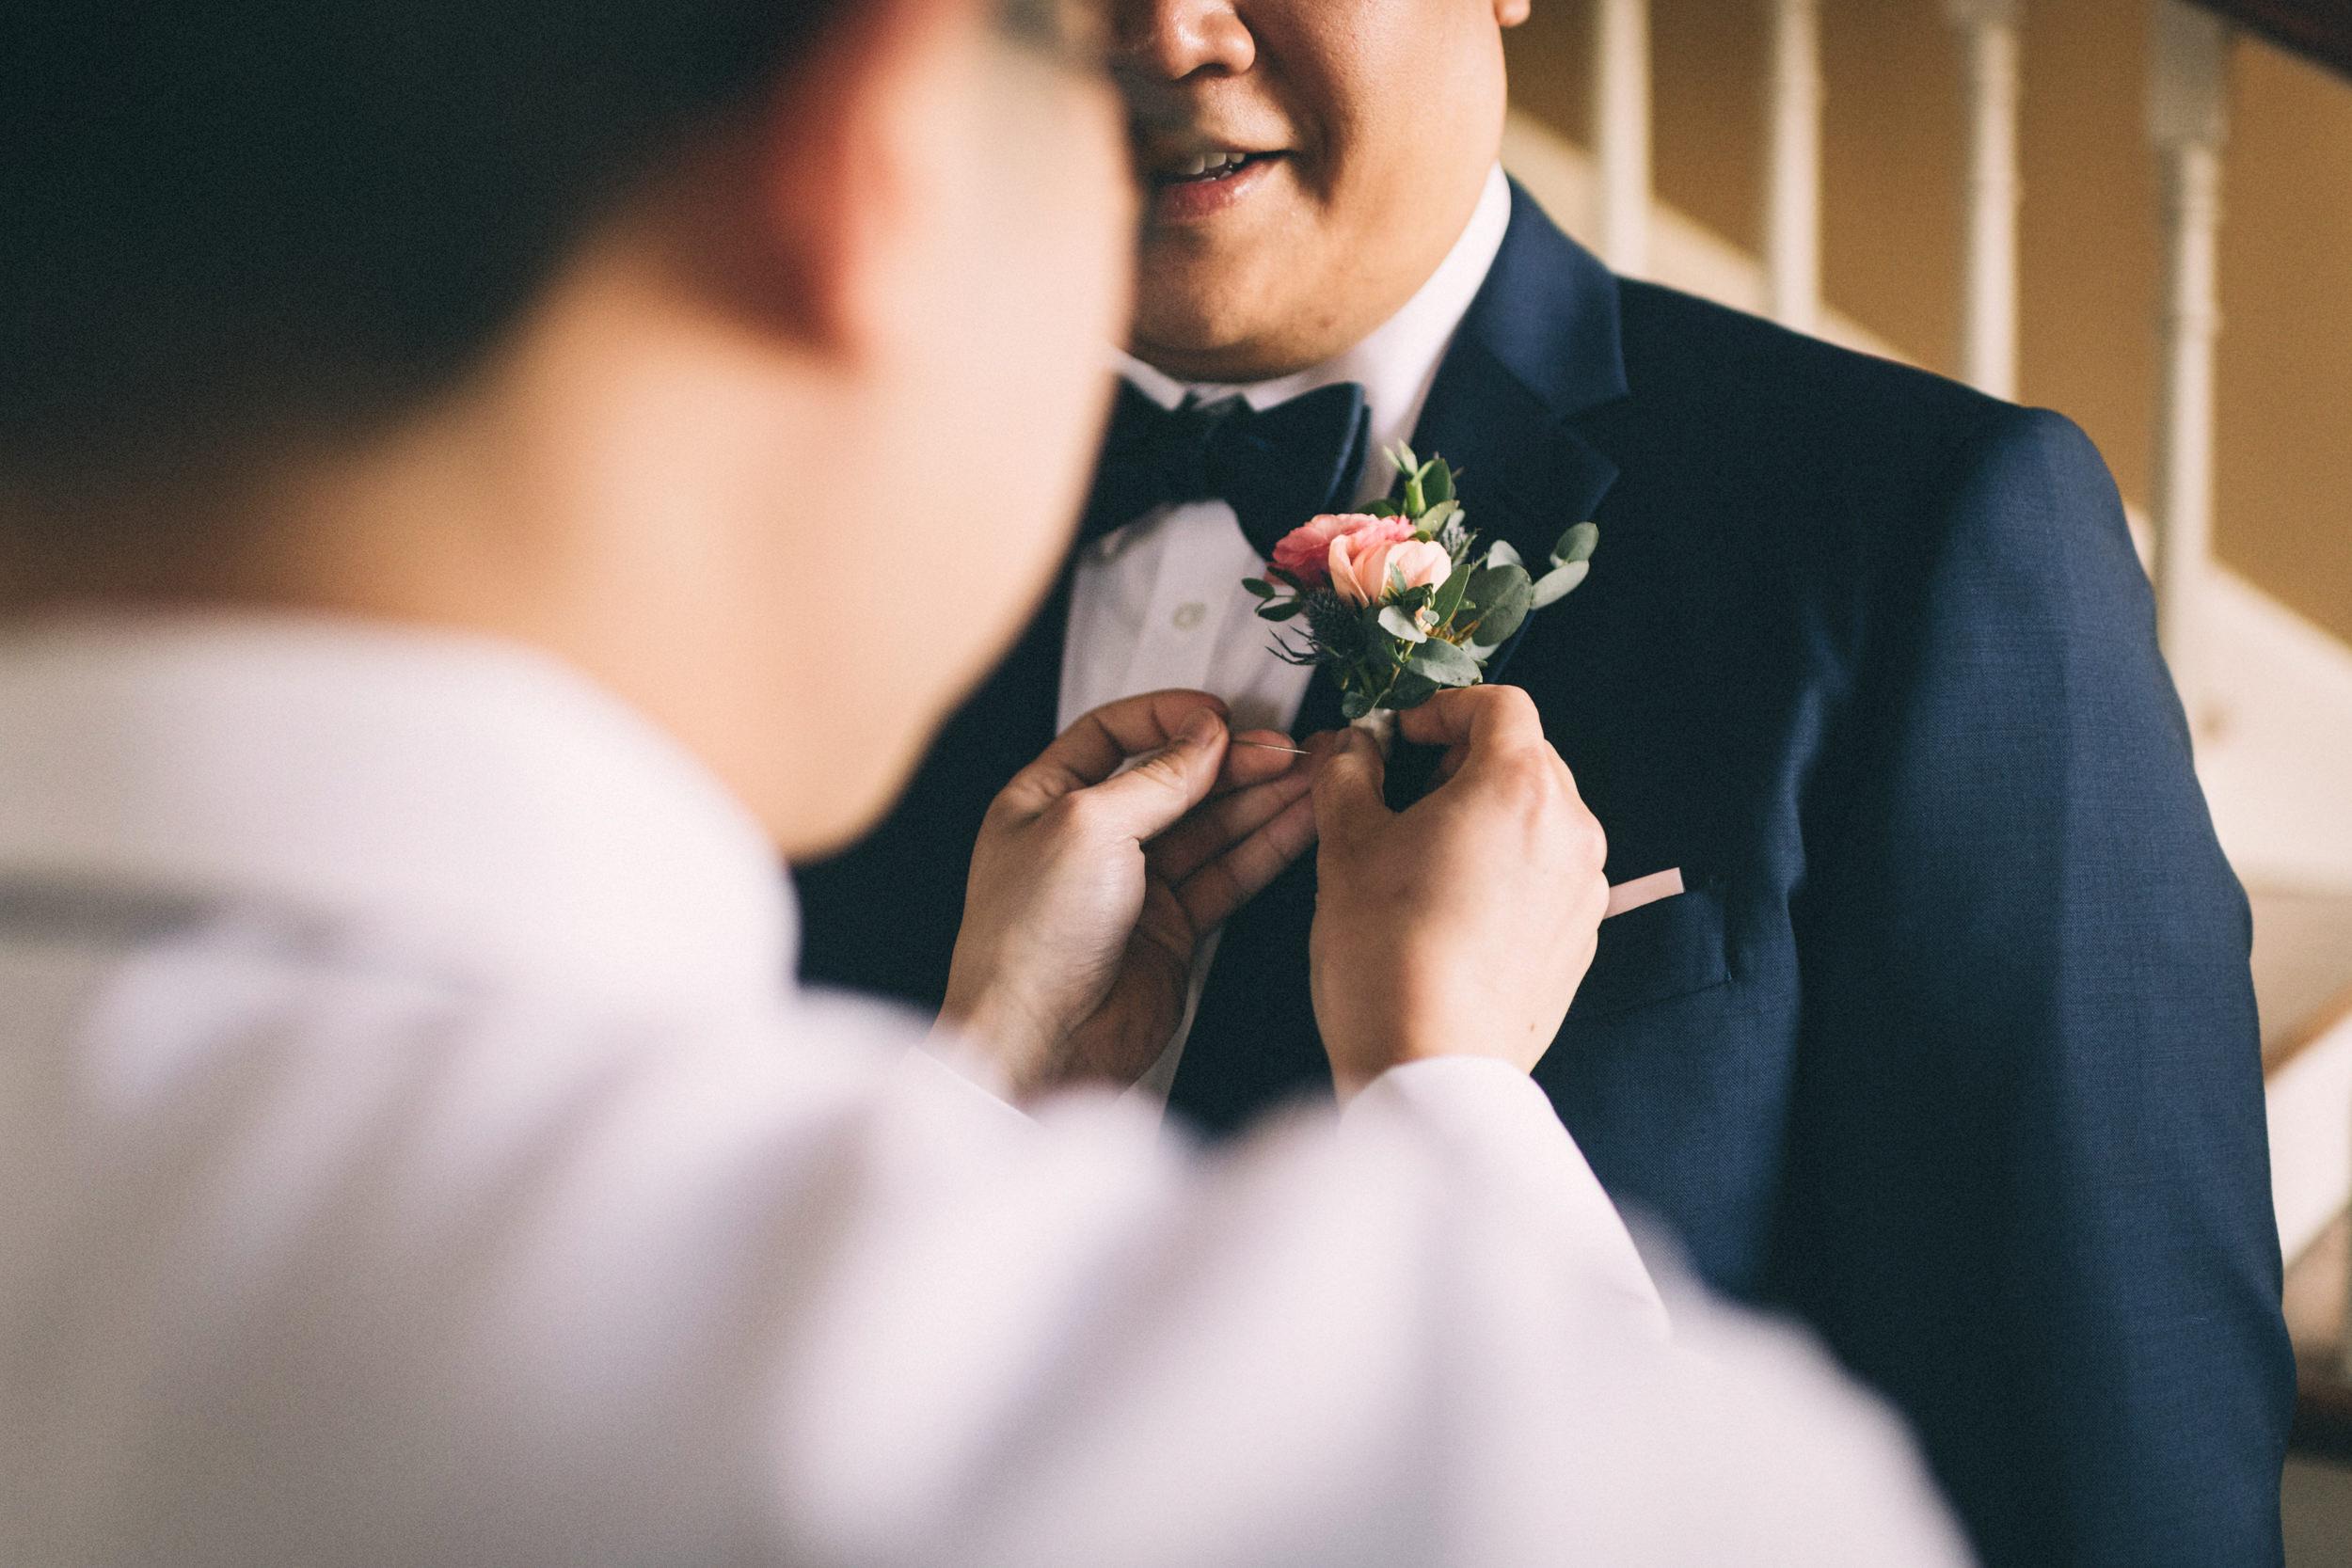 lauren-dean-wedding-grand-lodge-kentucky-sarah-katherine-davis-photography-103edit.jpg